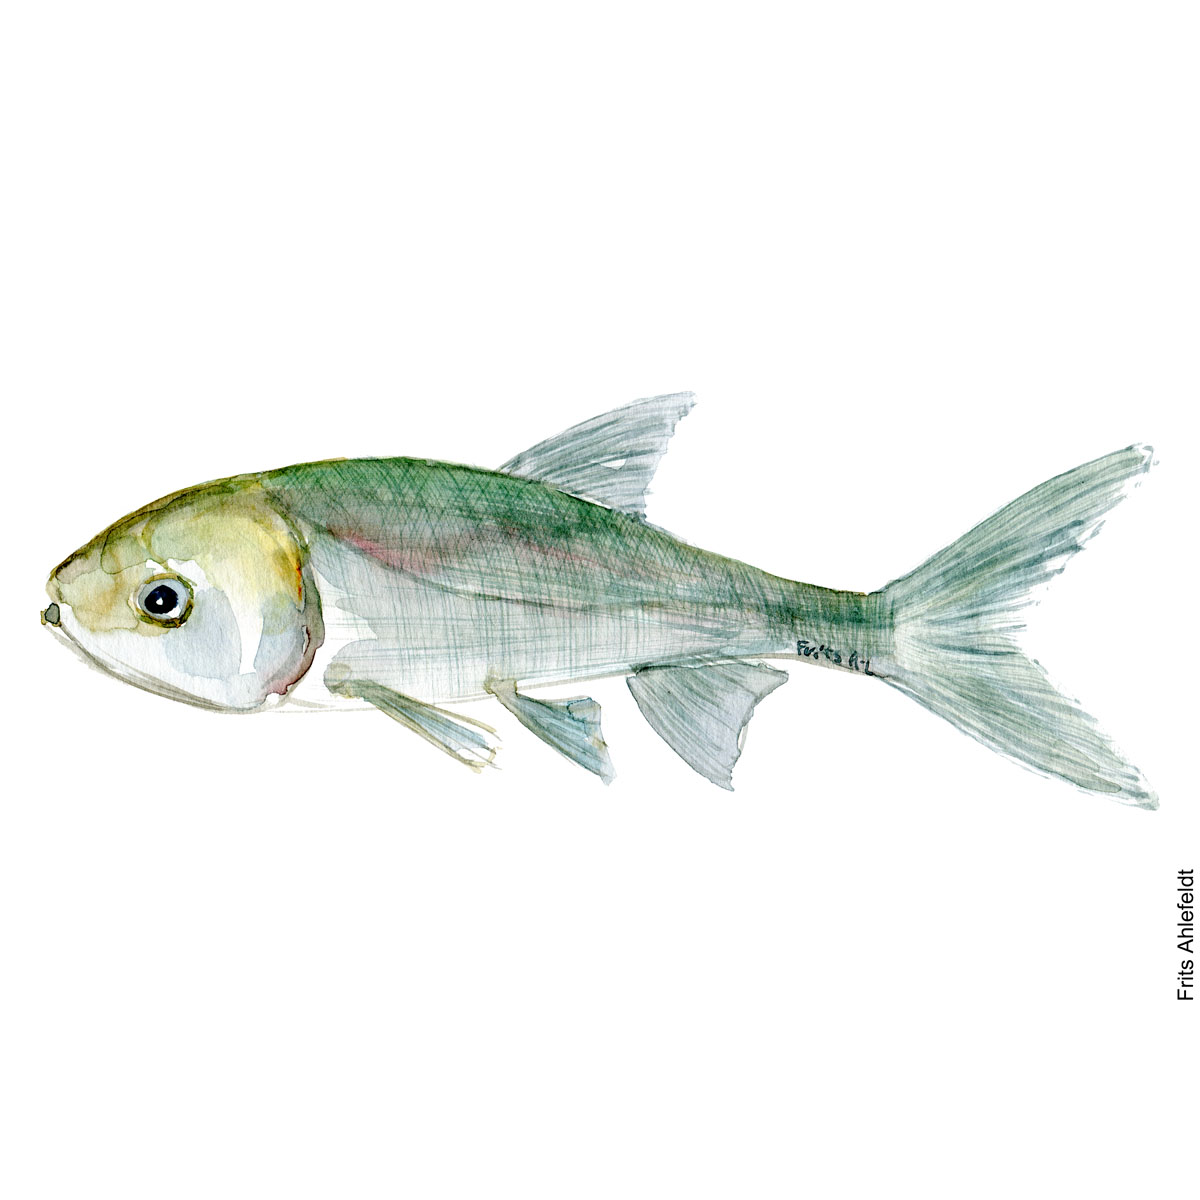 Silver carp. Sølvkarpe. Watercolour, Freshwater fish illustration by Frits Ahlefeldt